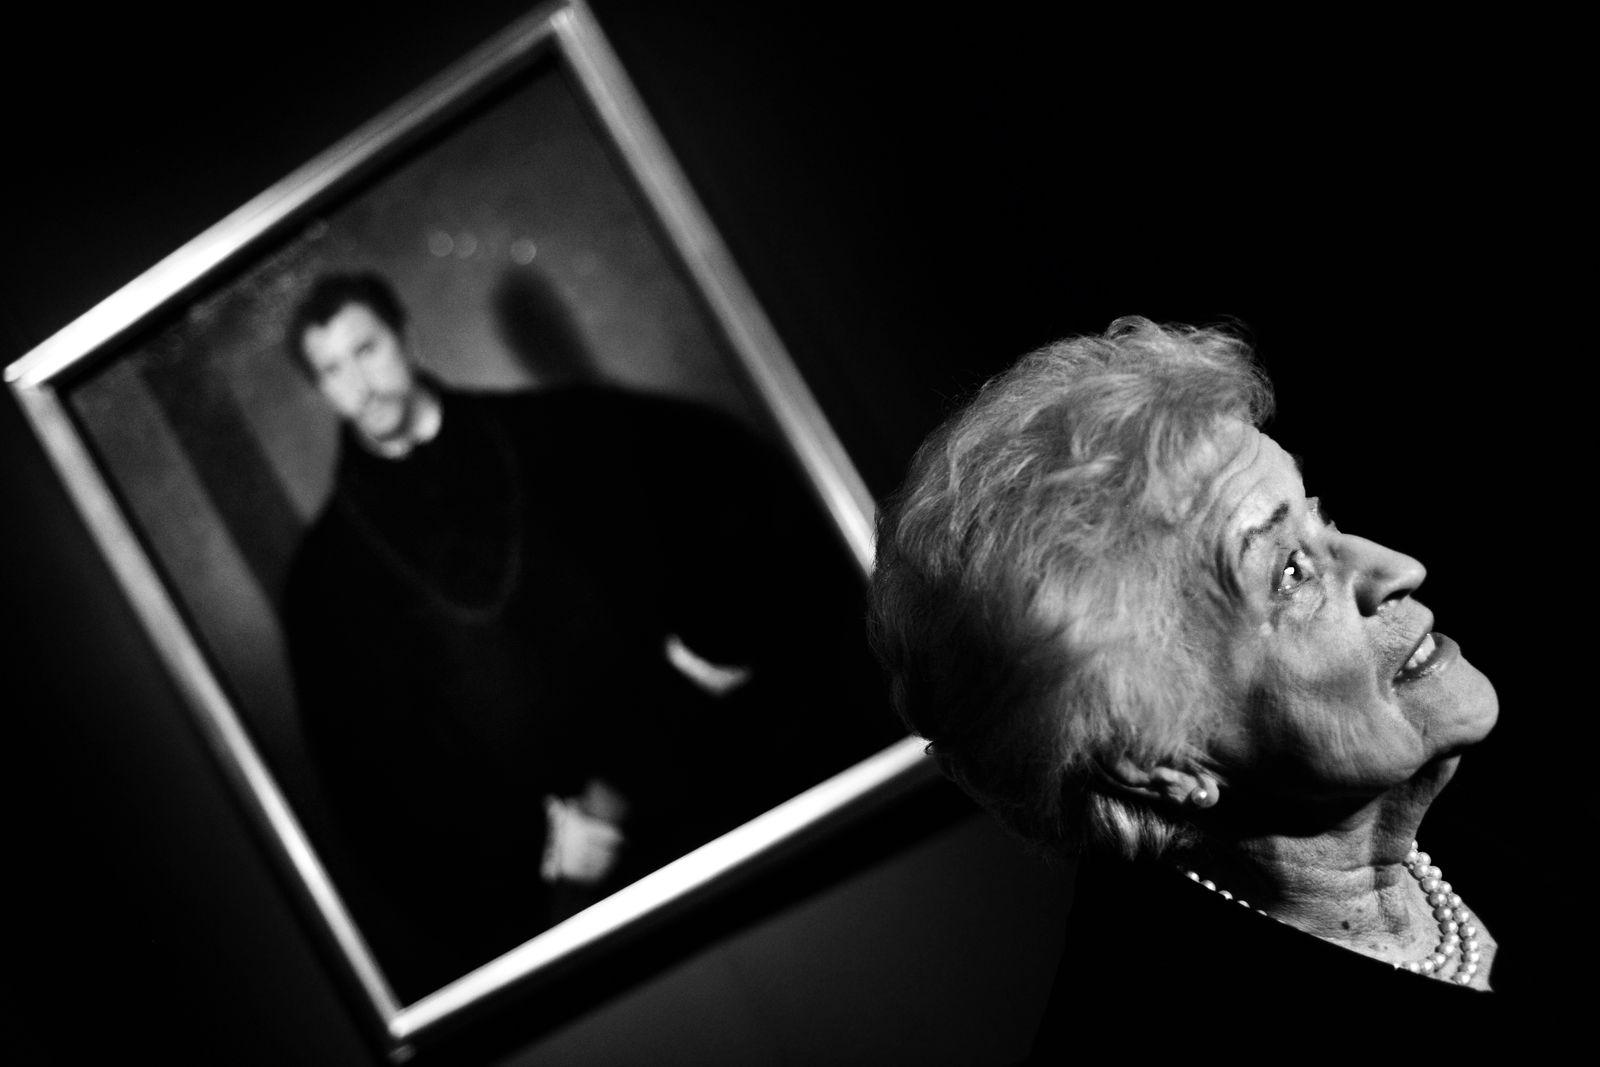 Vladimir Vyatkin receives Silver Camera Grand Prix